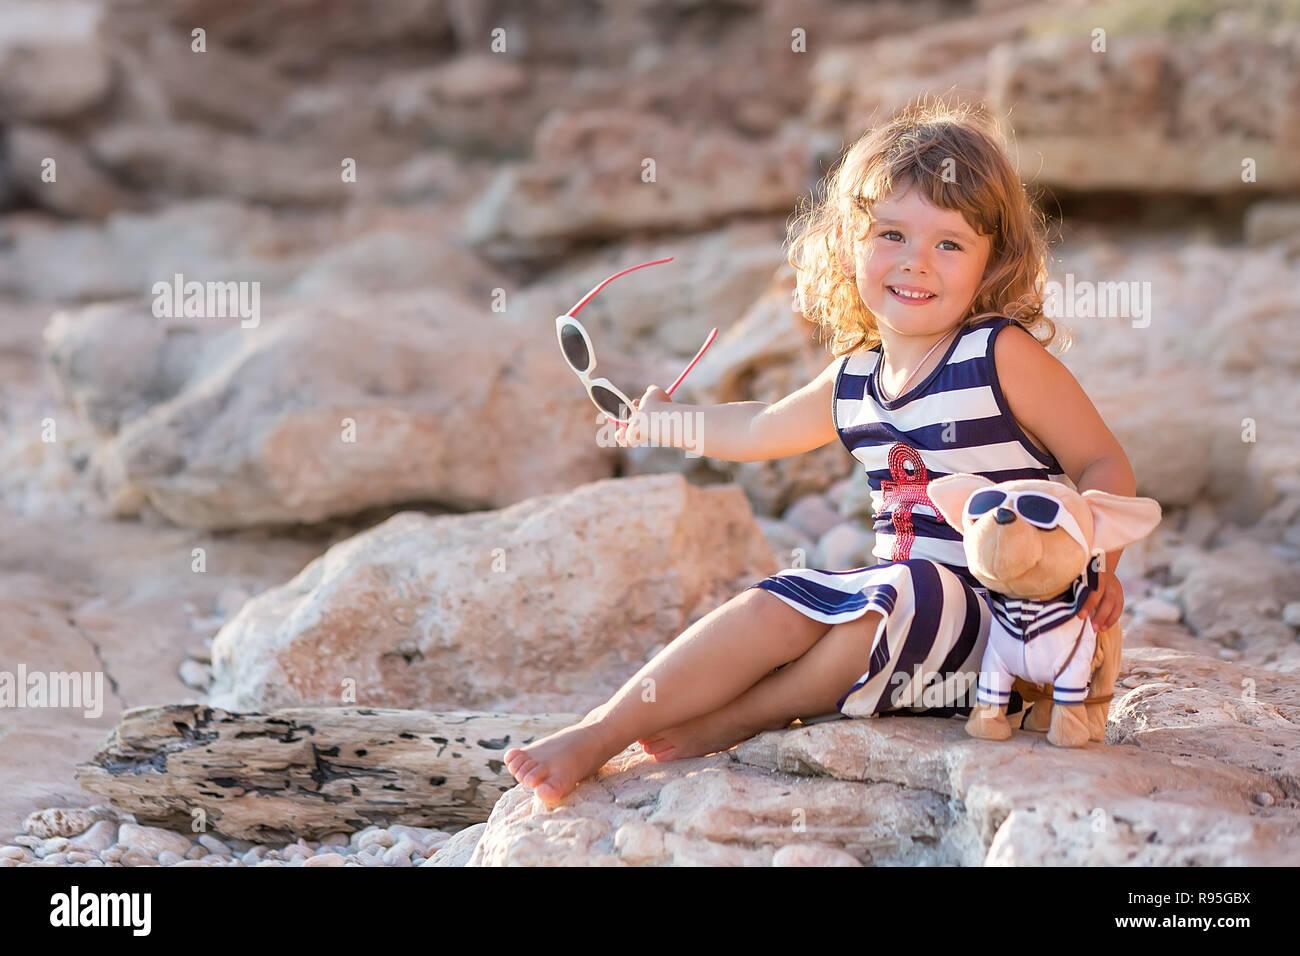 Beach Cute Girl Posing On A Rocky Beach Barefooted With Curly Hair